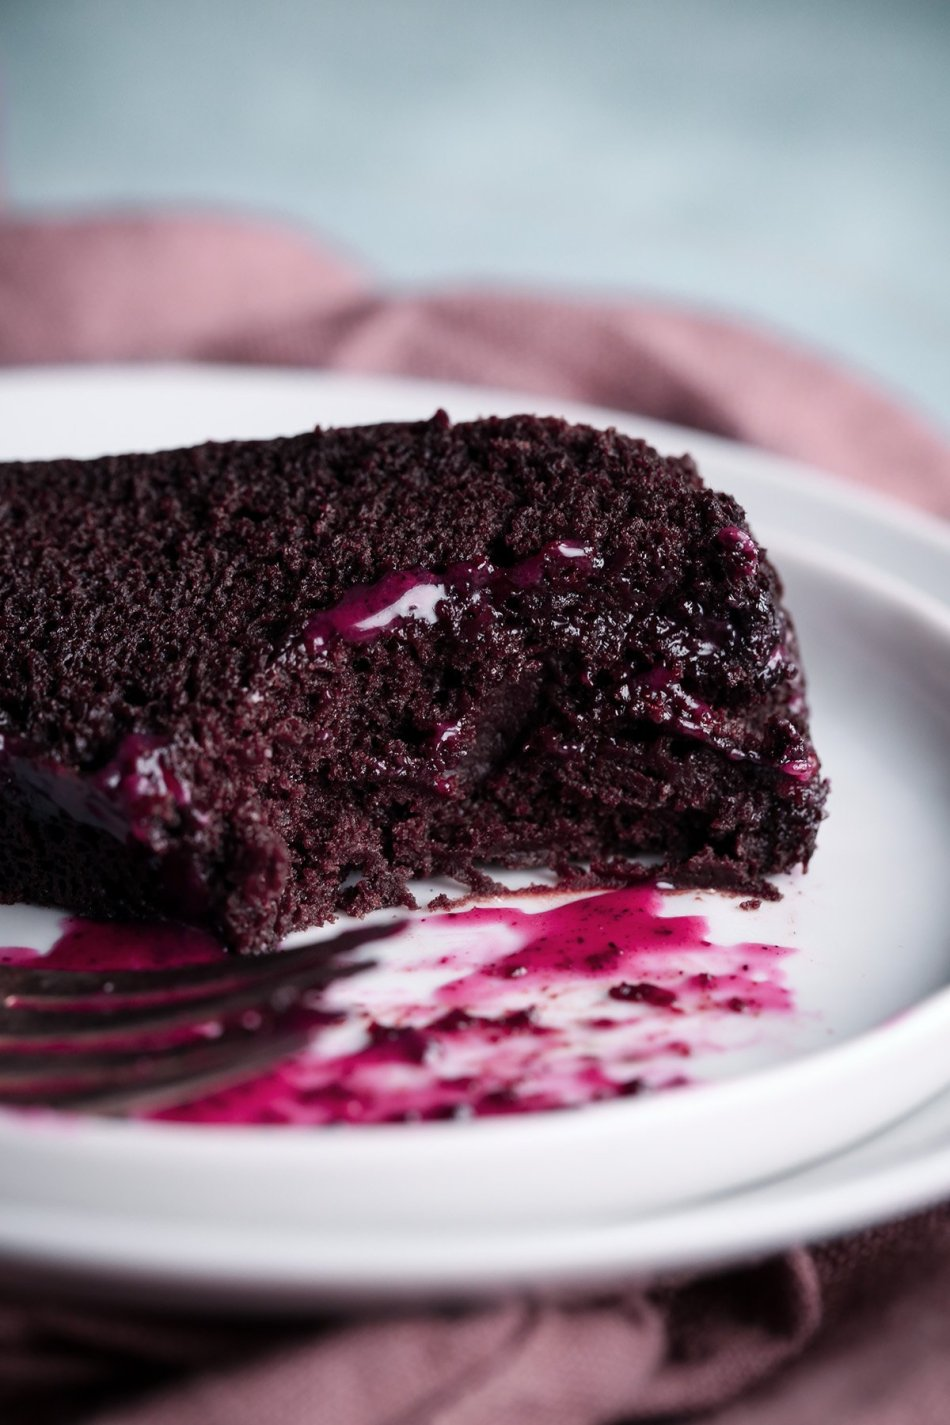 Chocolate Bundt Cake with Hibiscus Cream Cheese Glaze | Free of gluten, dairy, eggs, and refined sugar, plus vegan friendly